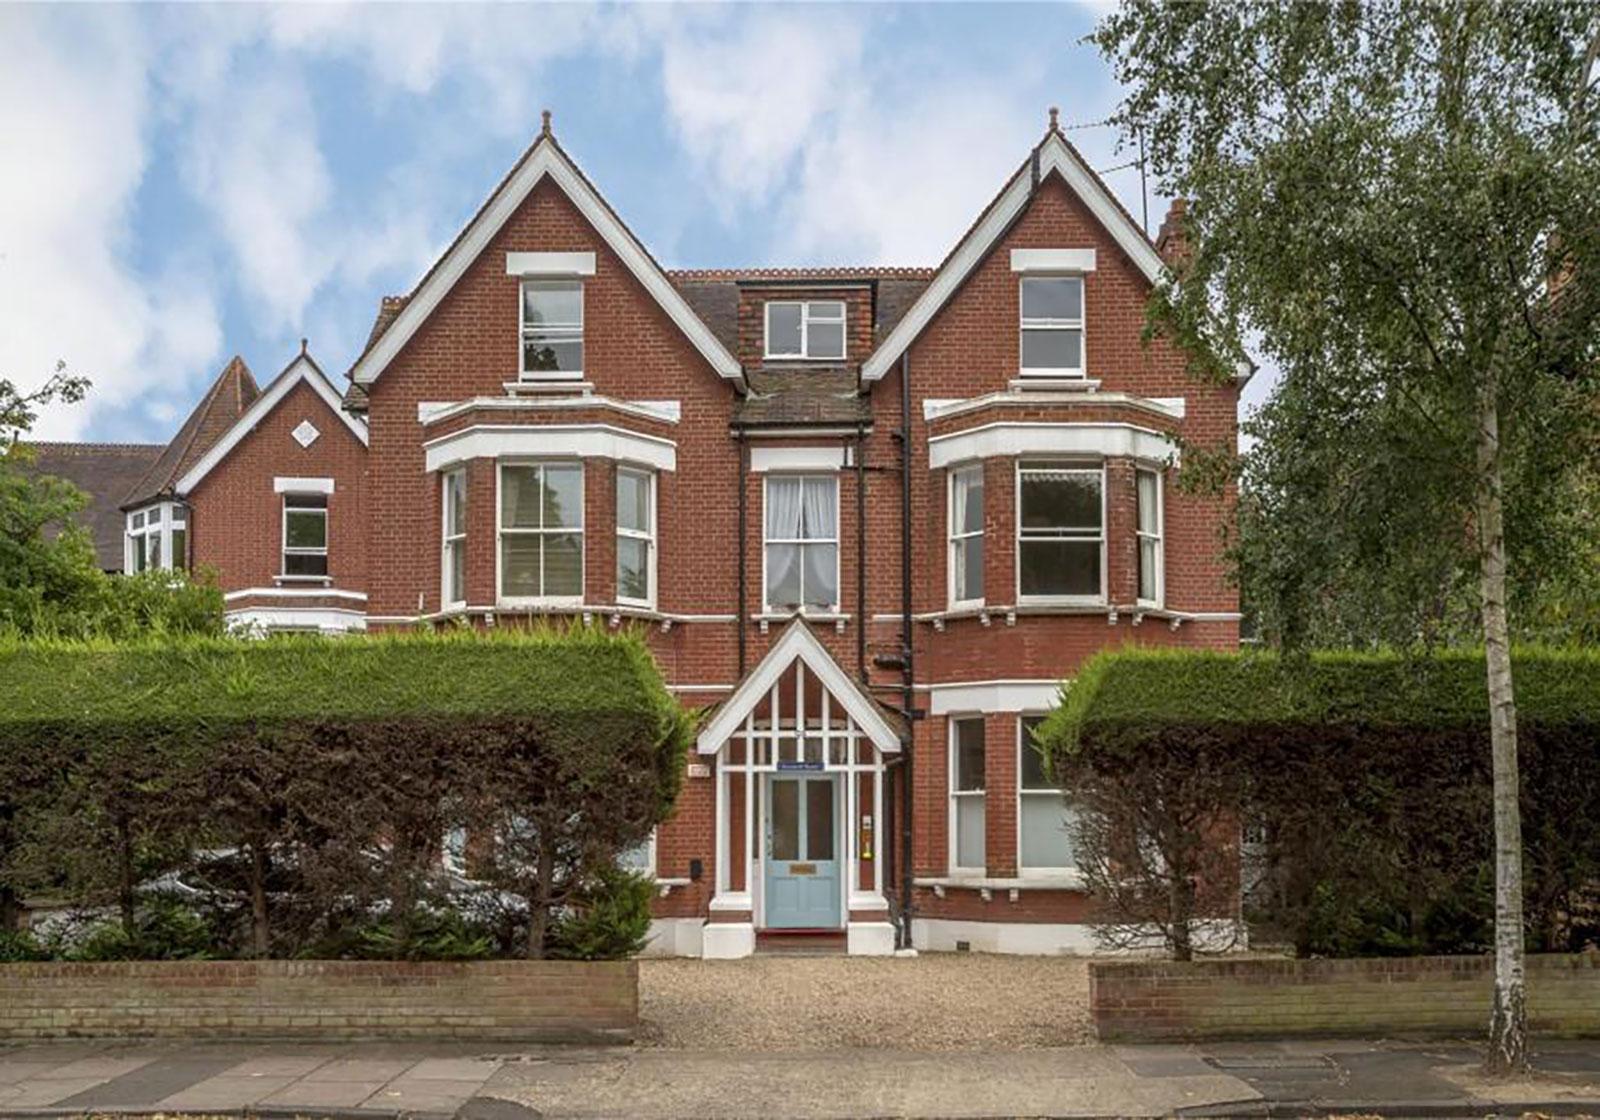 59 The Avenue, Kew, Richmond, TW9 2AL - Antony Roberts